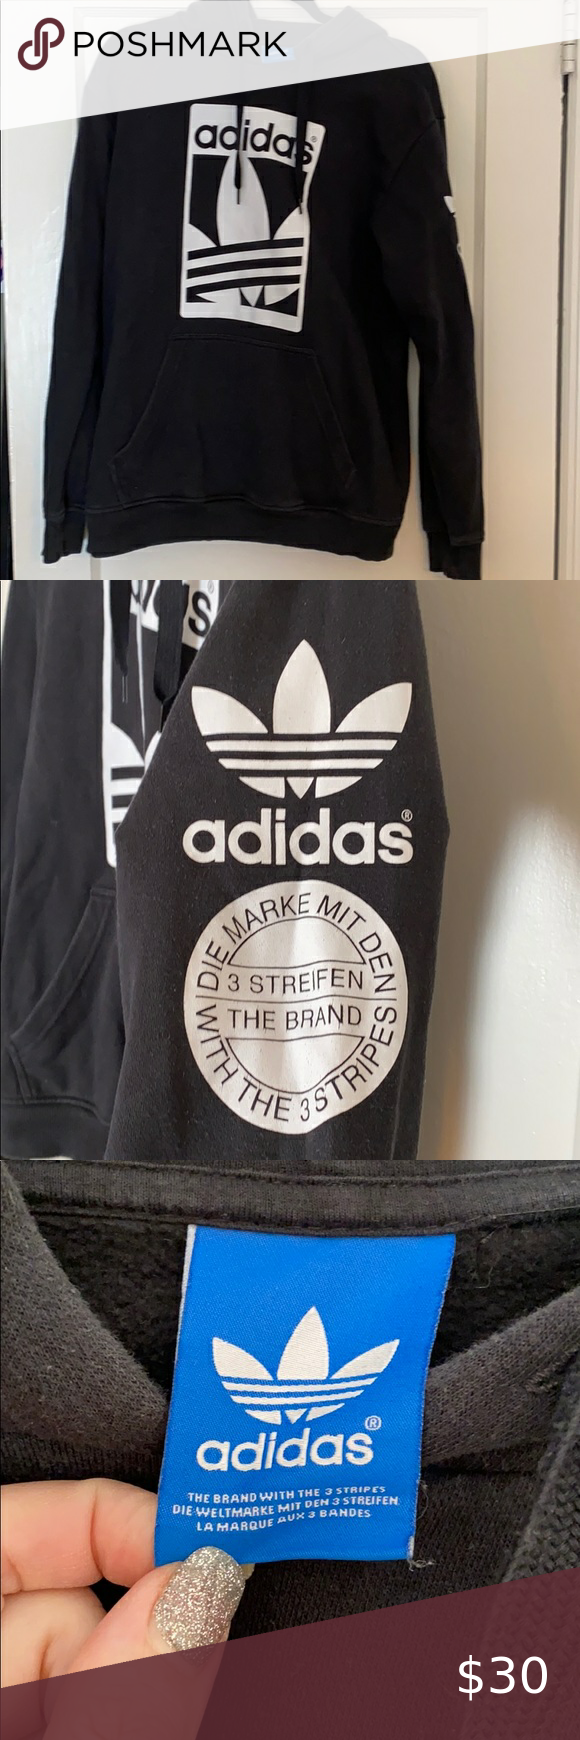 Adidas Sweatshirt Multiple Logos Cute Lightweight Adidas Black And White Sweatshirt Has Kang Adidas Sweatshirt Black Sweatshirt Hoodie Black Pullover Hoodie [ 1740 x 580 Pixel ]